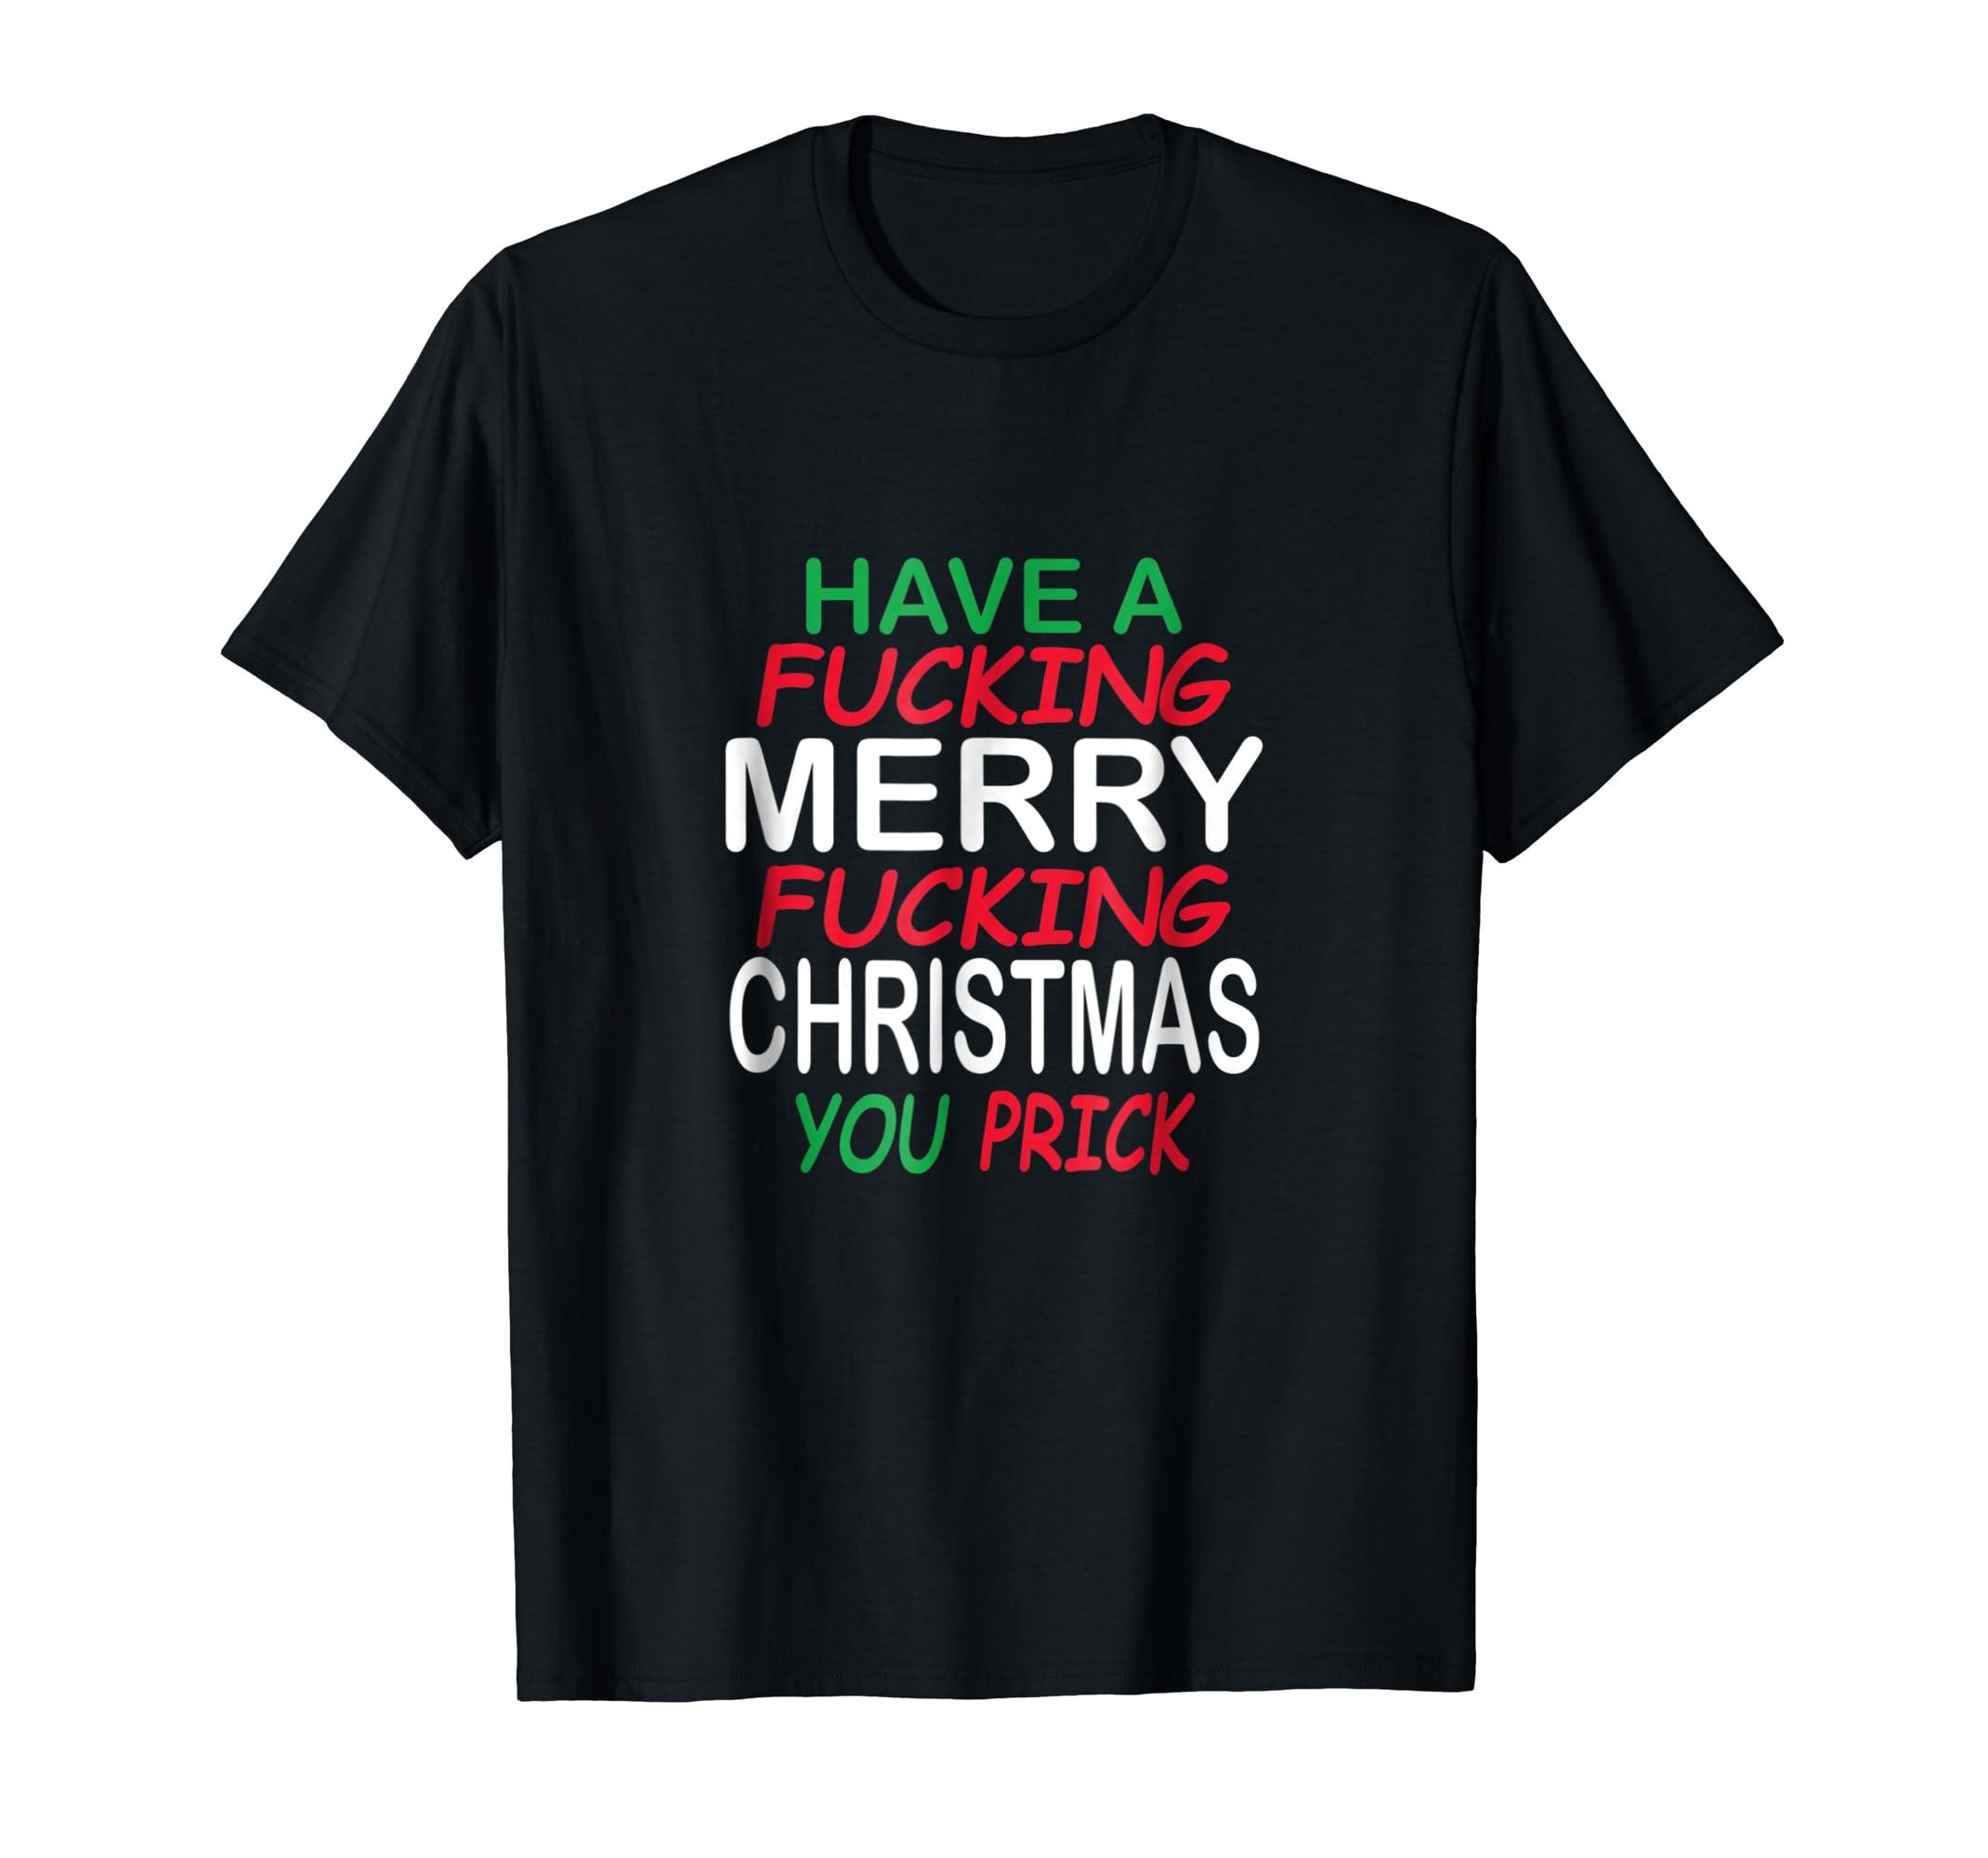 933586abc Amazon.com: Fucking Merry Christmas Funny Dirty Adult Joke TShirt: Clothing